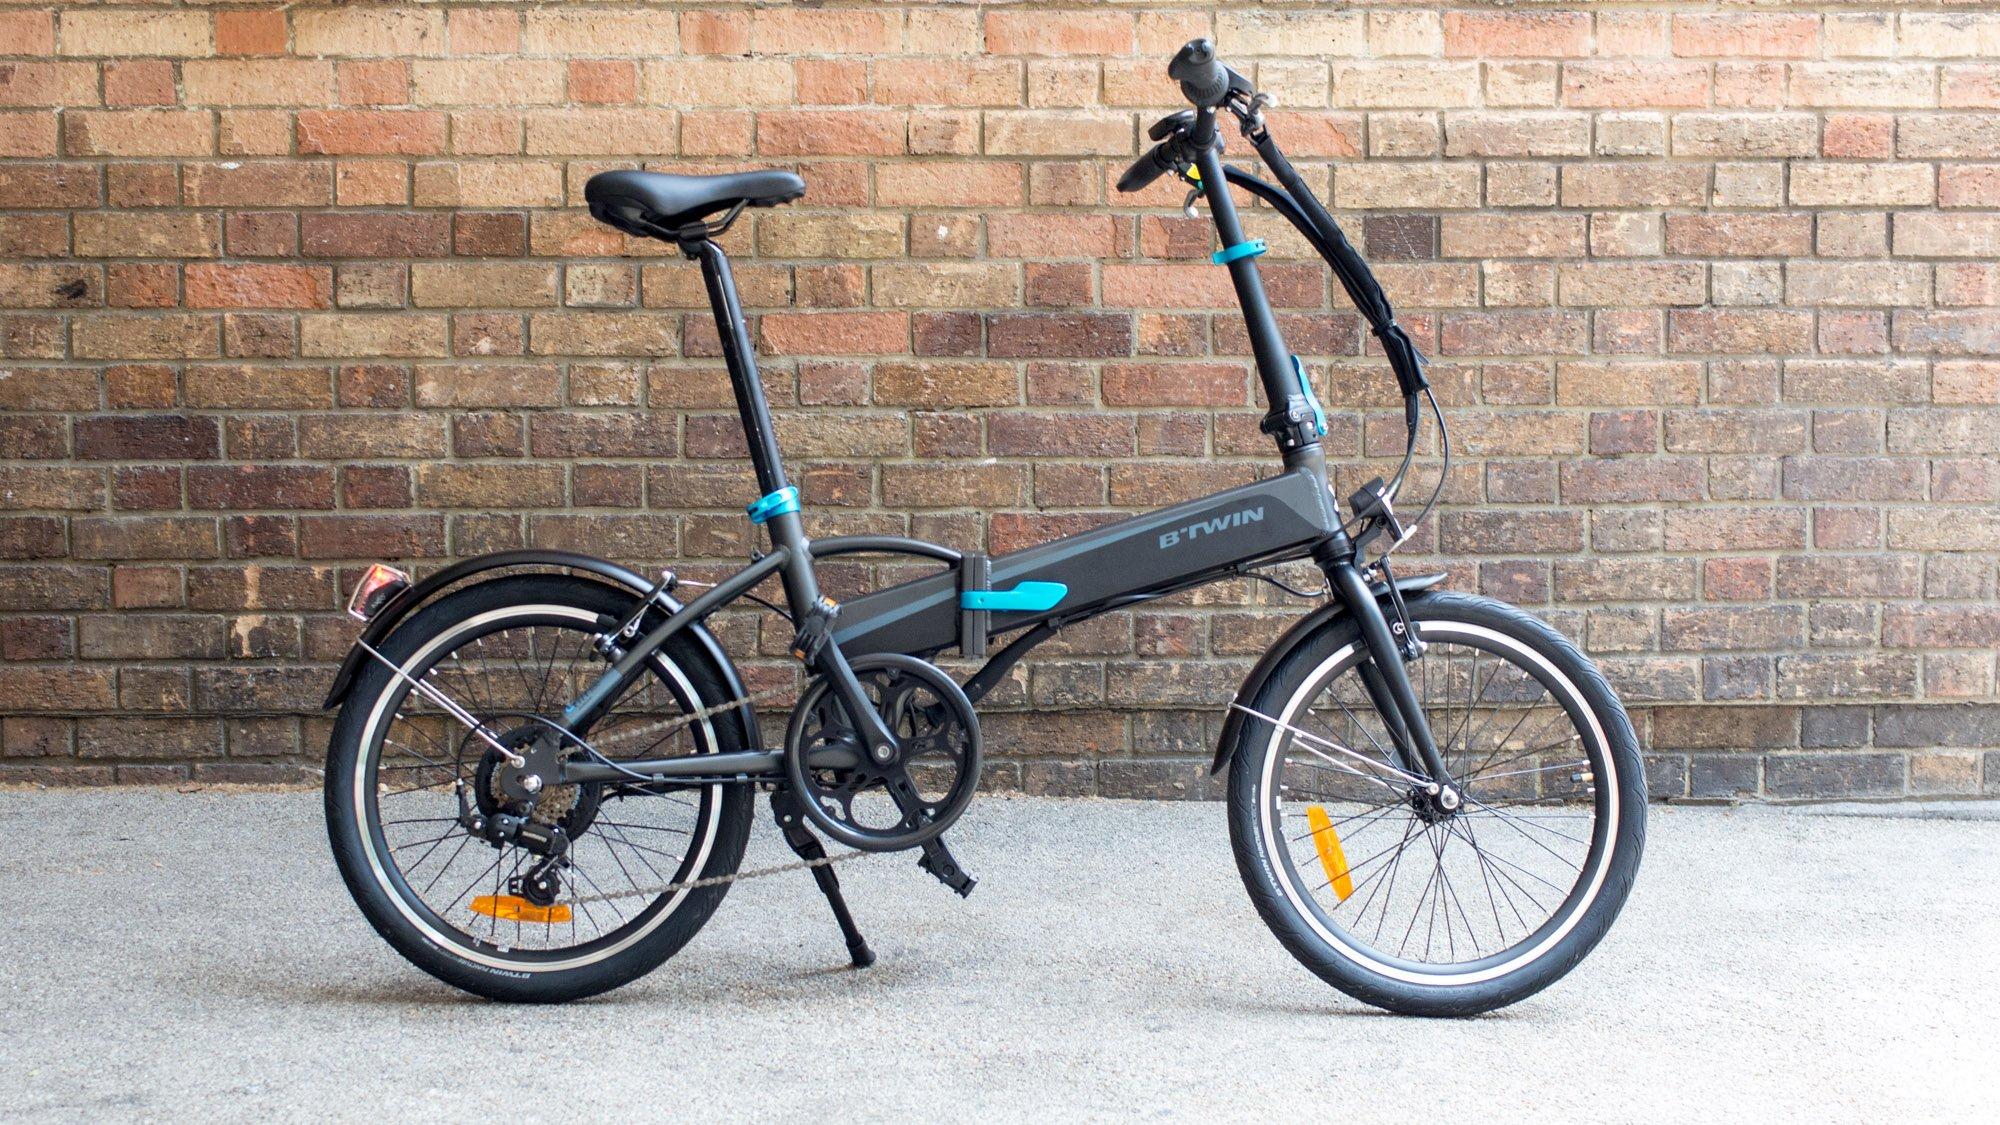 b 39 twin tilt 500 electric e bike review the best budget folding electric bike expert reviews. Black Bedroom Furniture Sets. Home Design Ideas